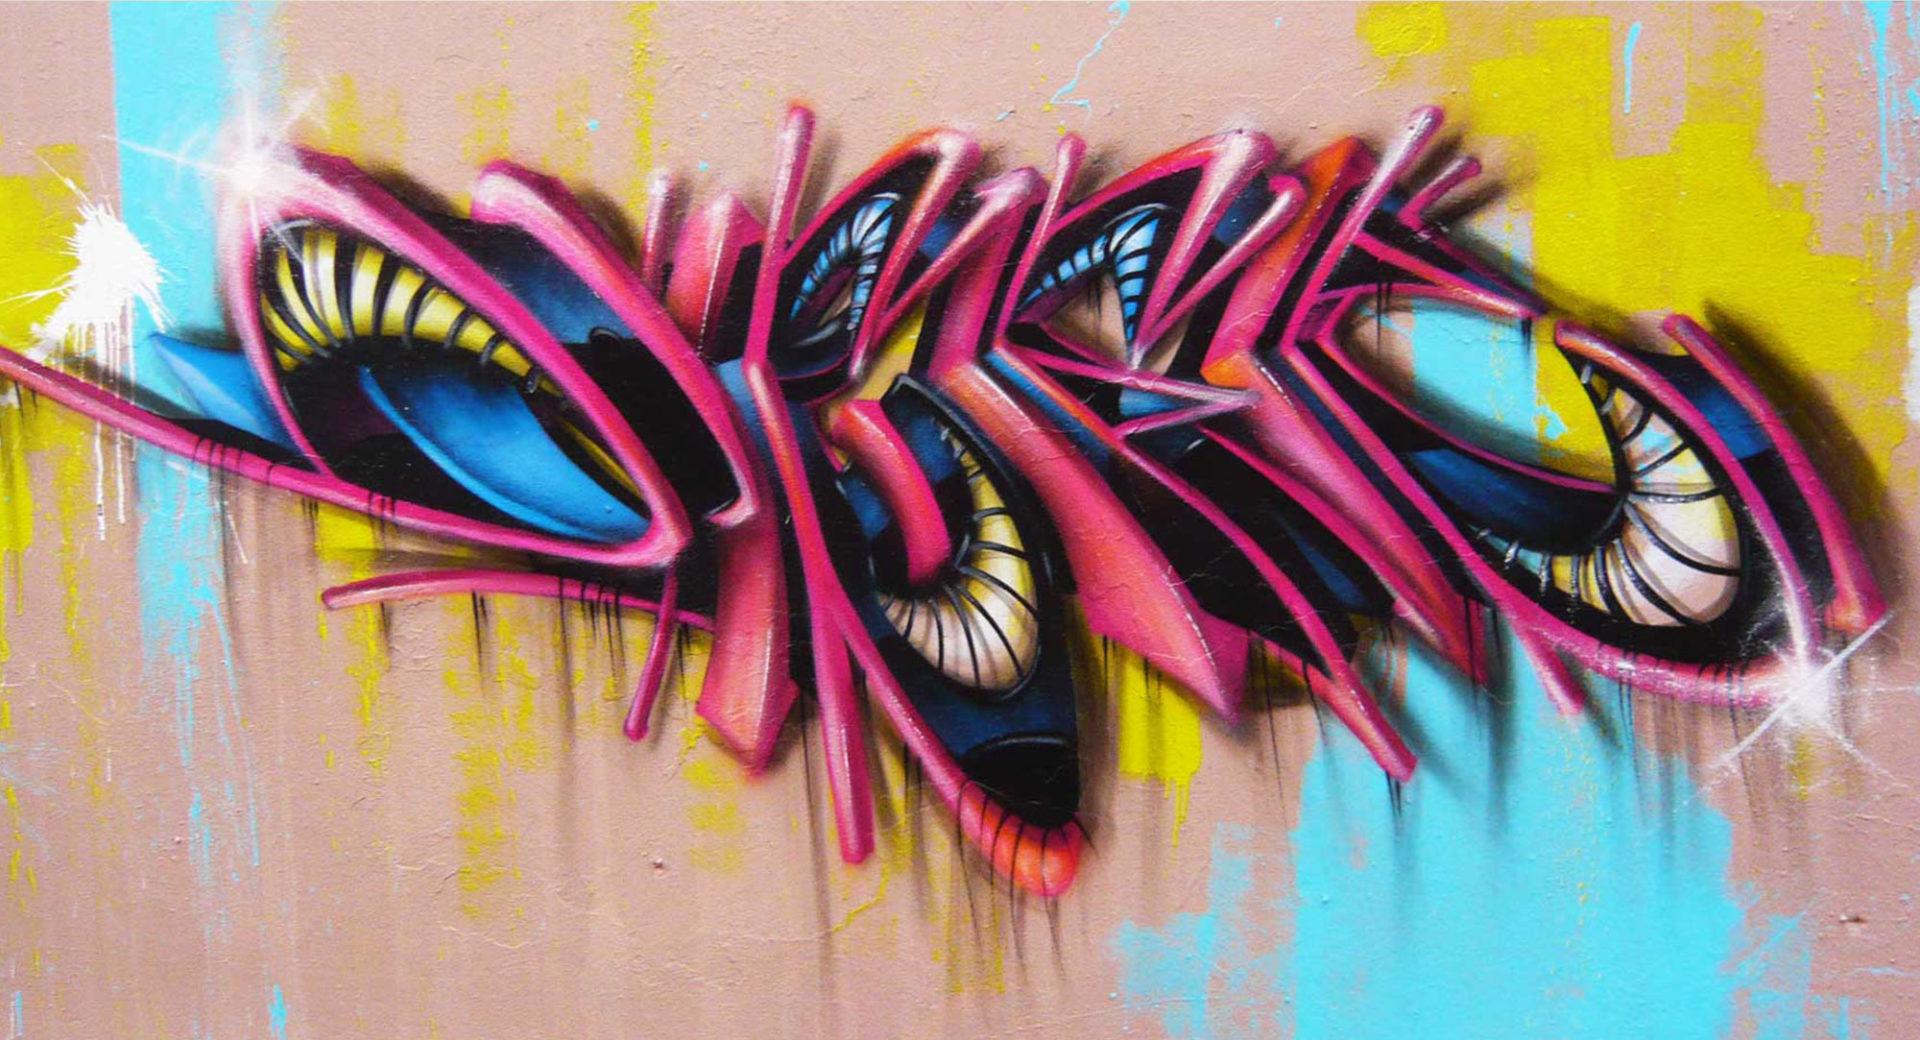 Deft - ENSACF - Graffiti - Clermont-Ferrand